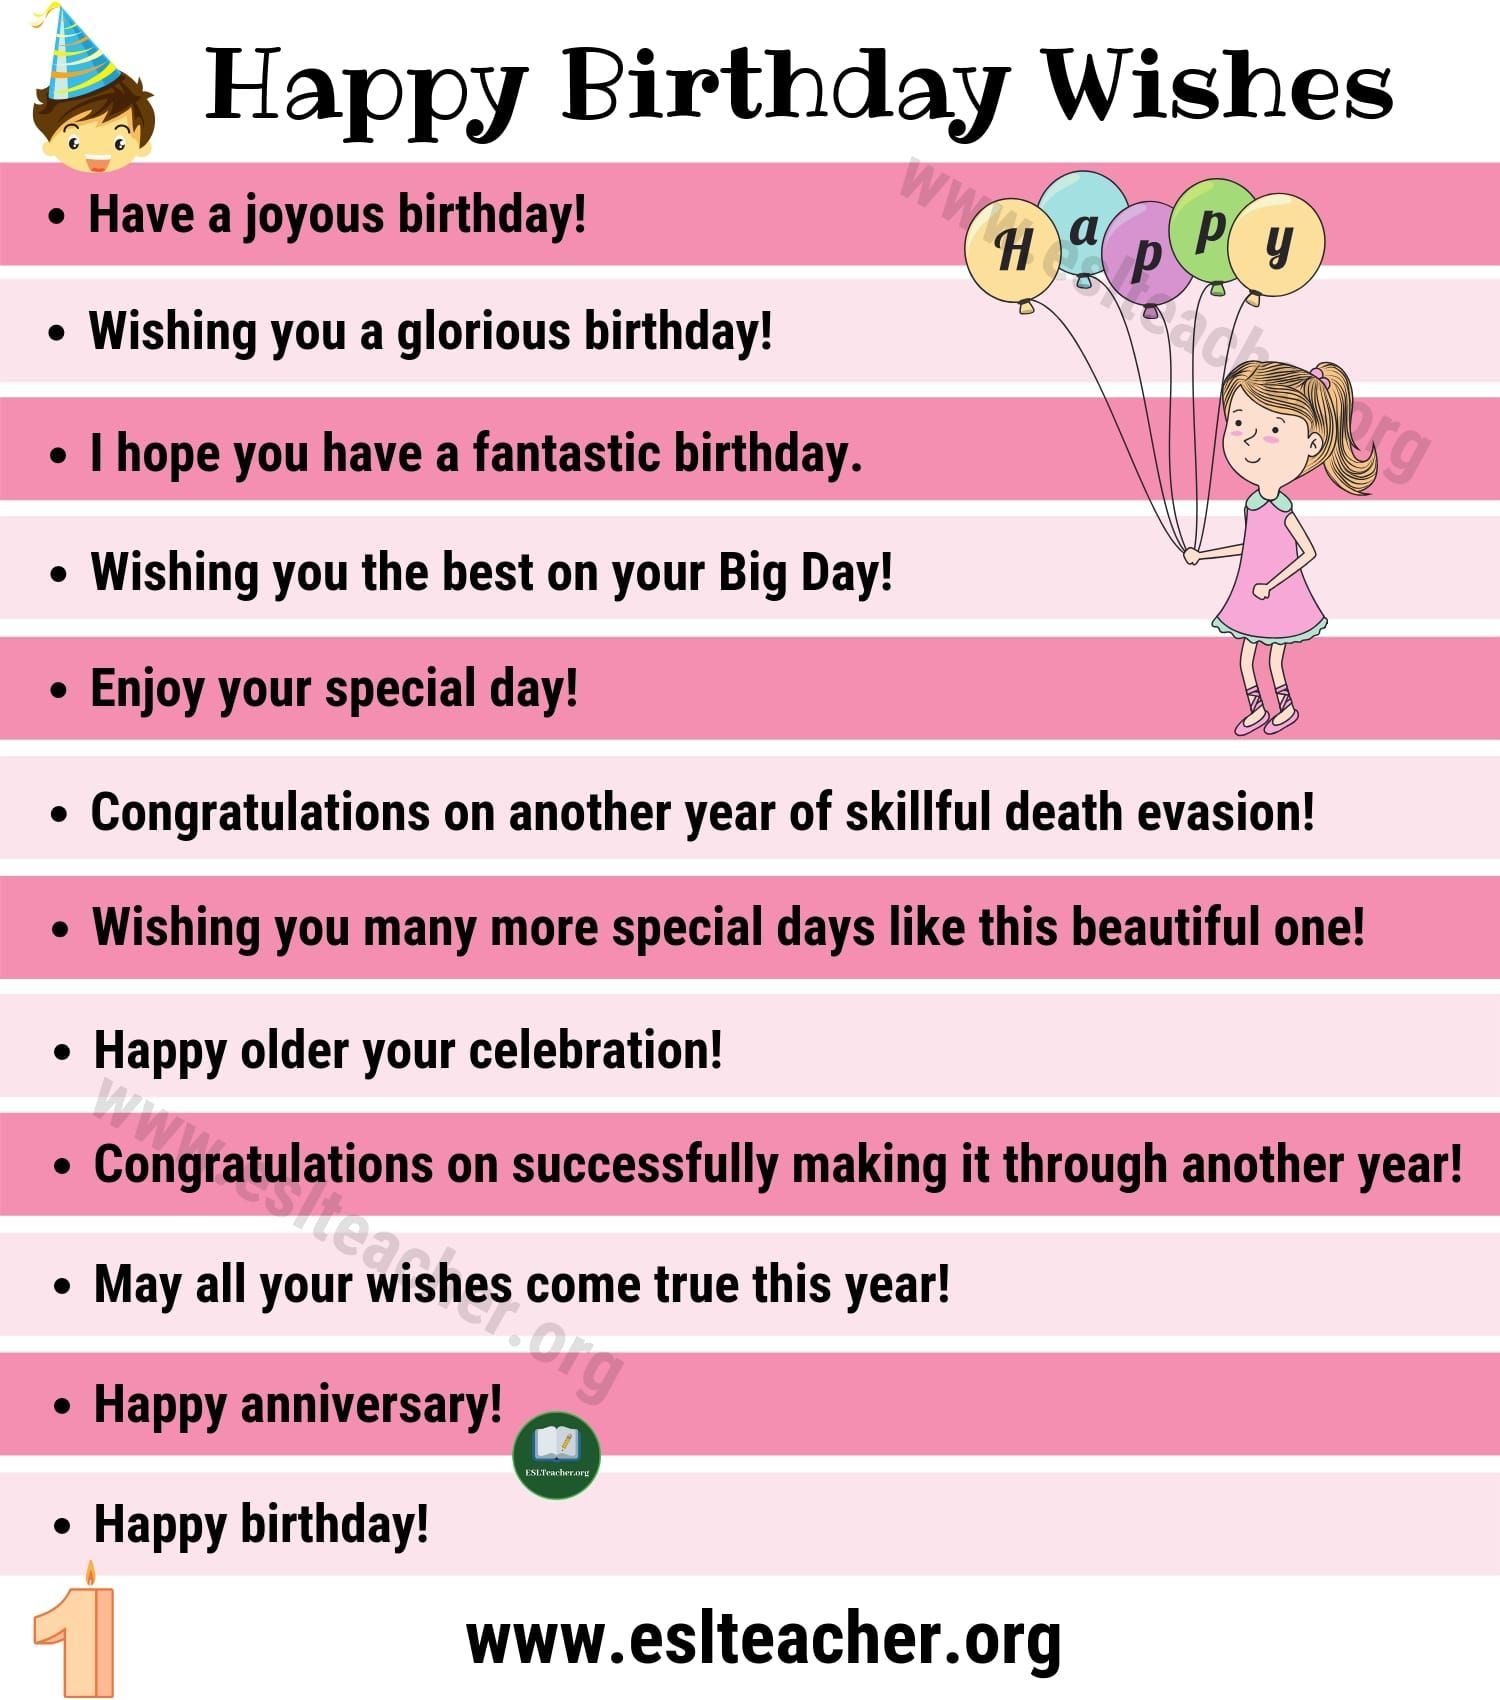 Birthday Wishes 35 Funny Ways To Say Happy Birthday In English Esl Teacher Birthday Wishes Quotes Birthday Wishes Learn English